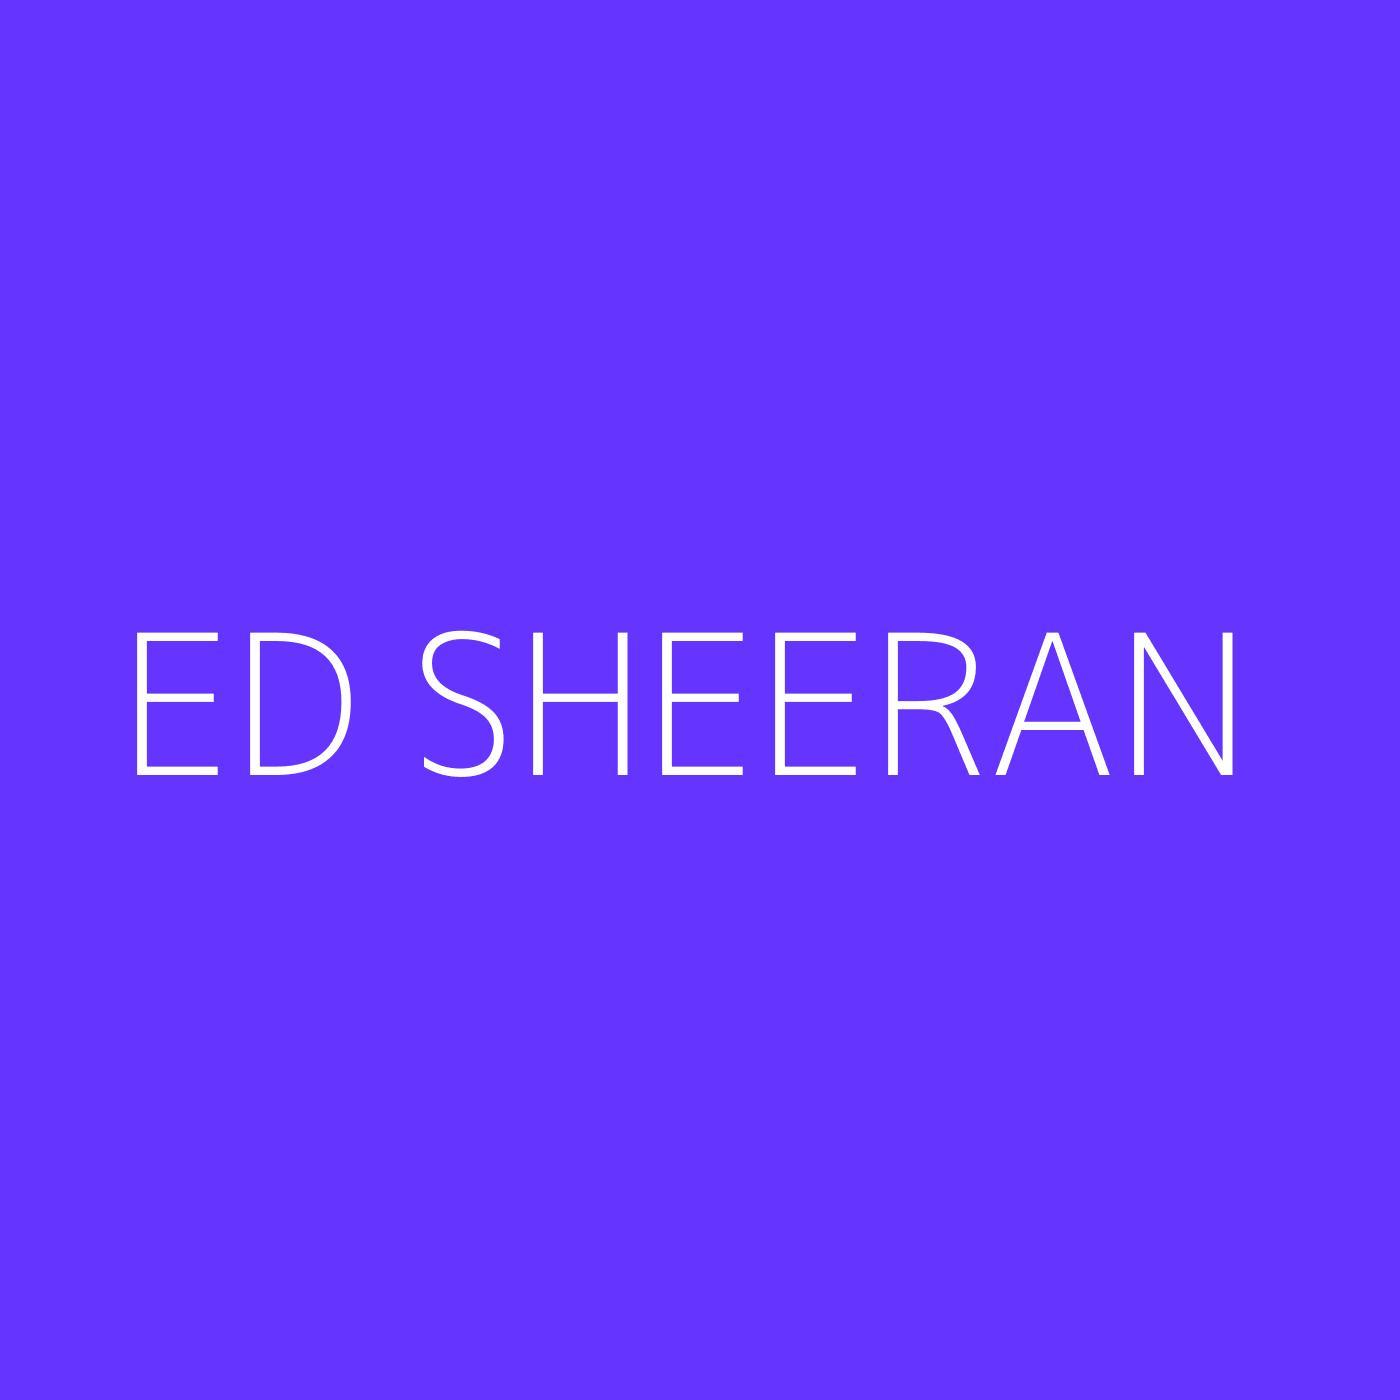 Ed Sheeran Playlist Artwork